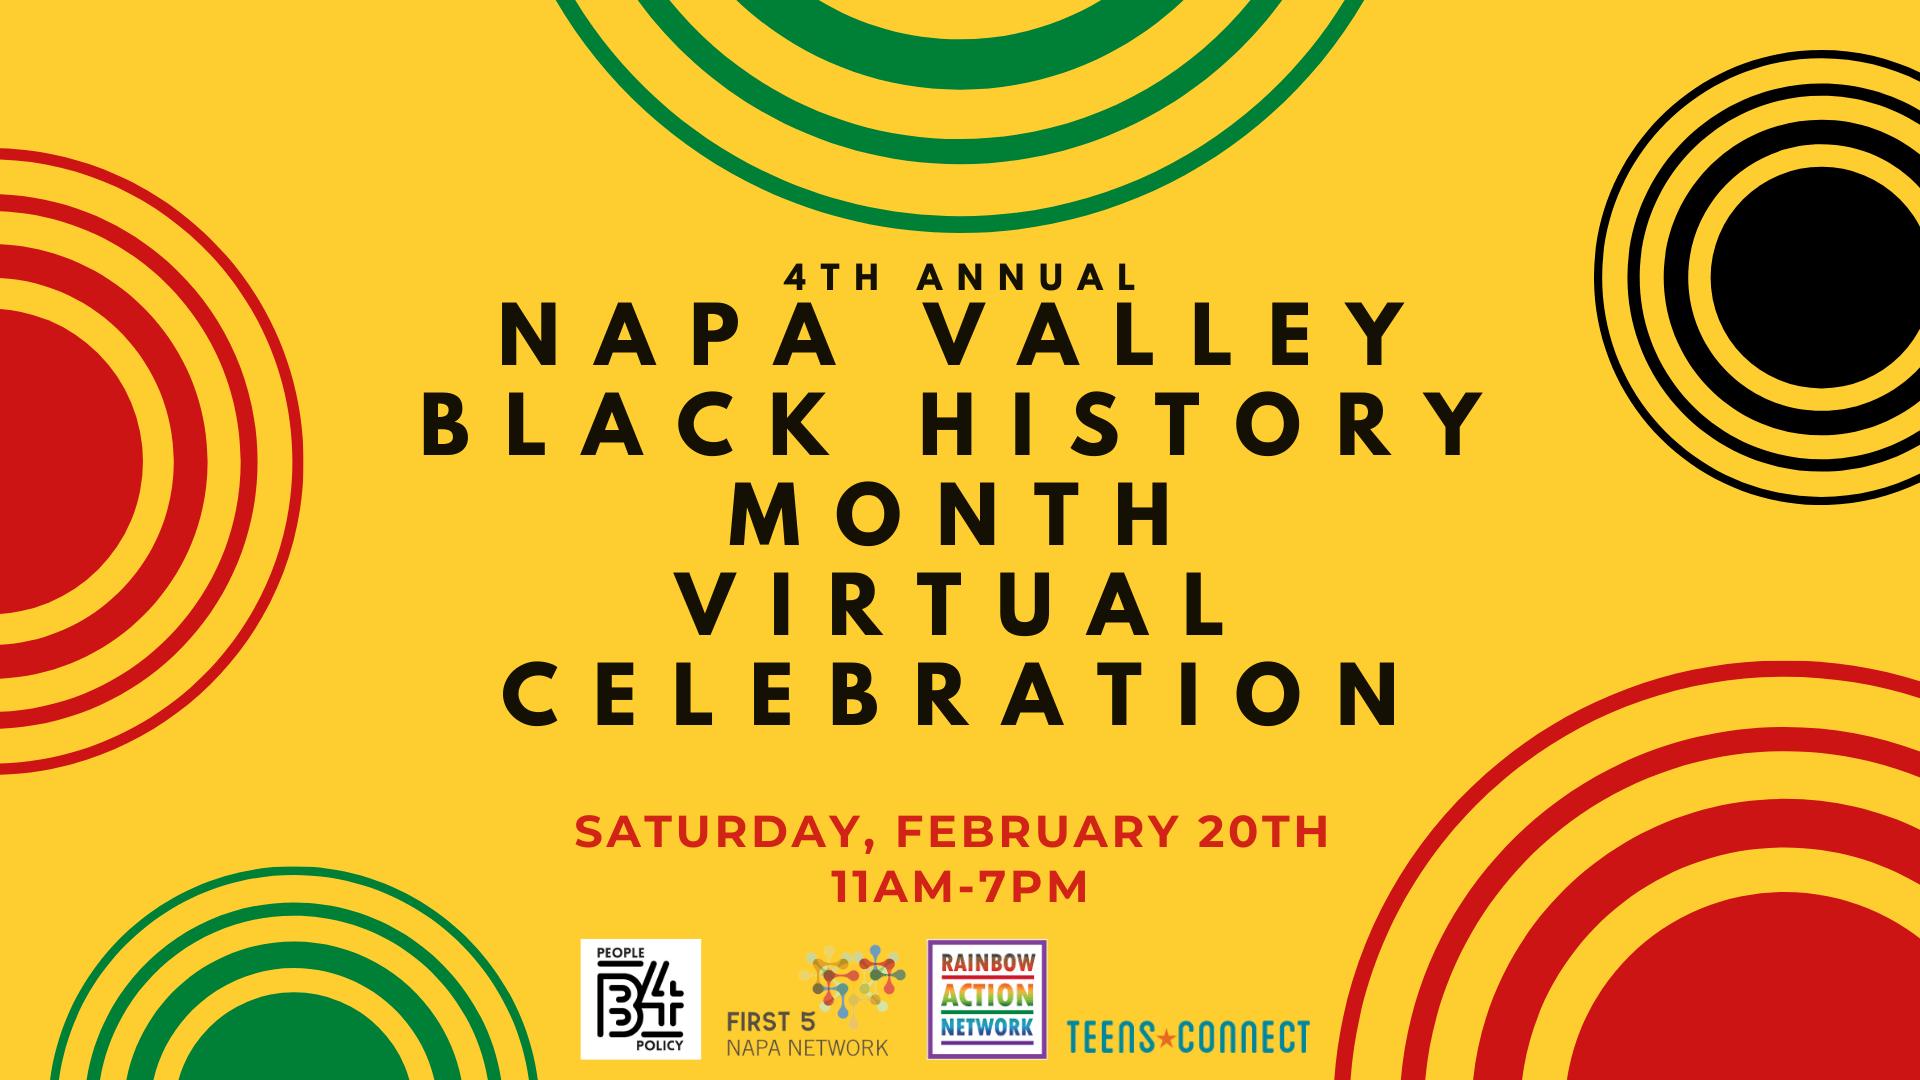 Napa Valley Black History Month Celebration